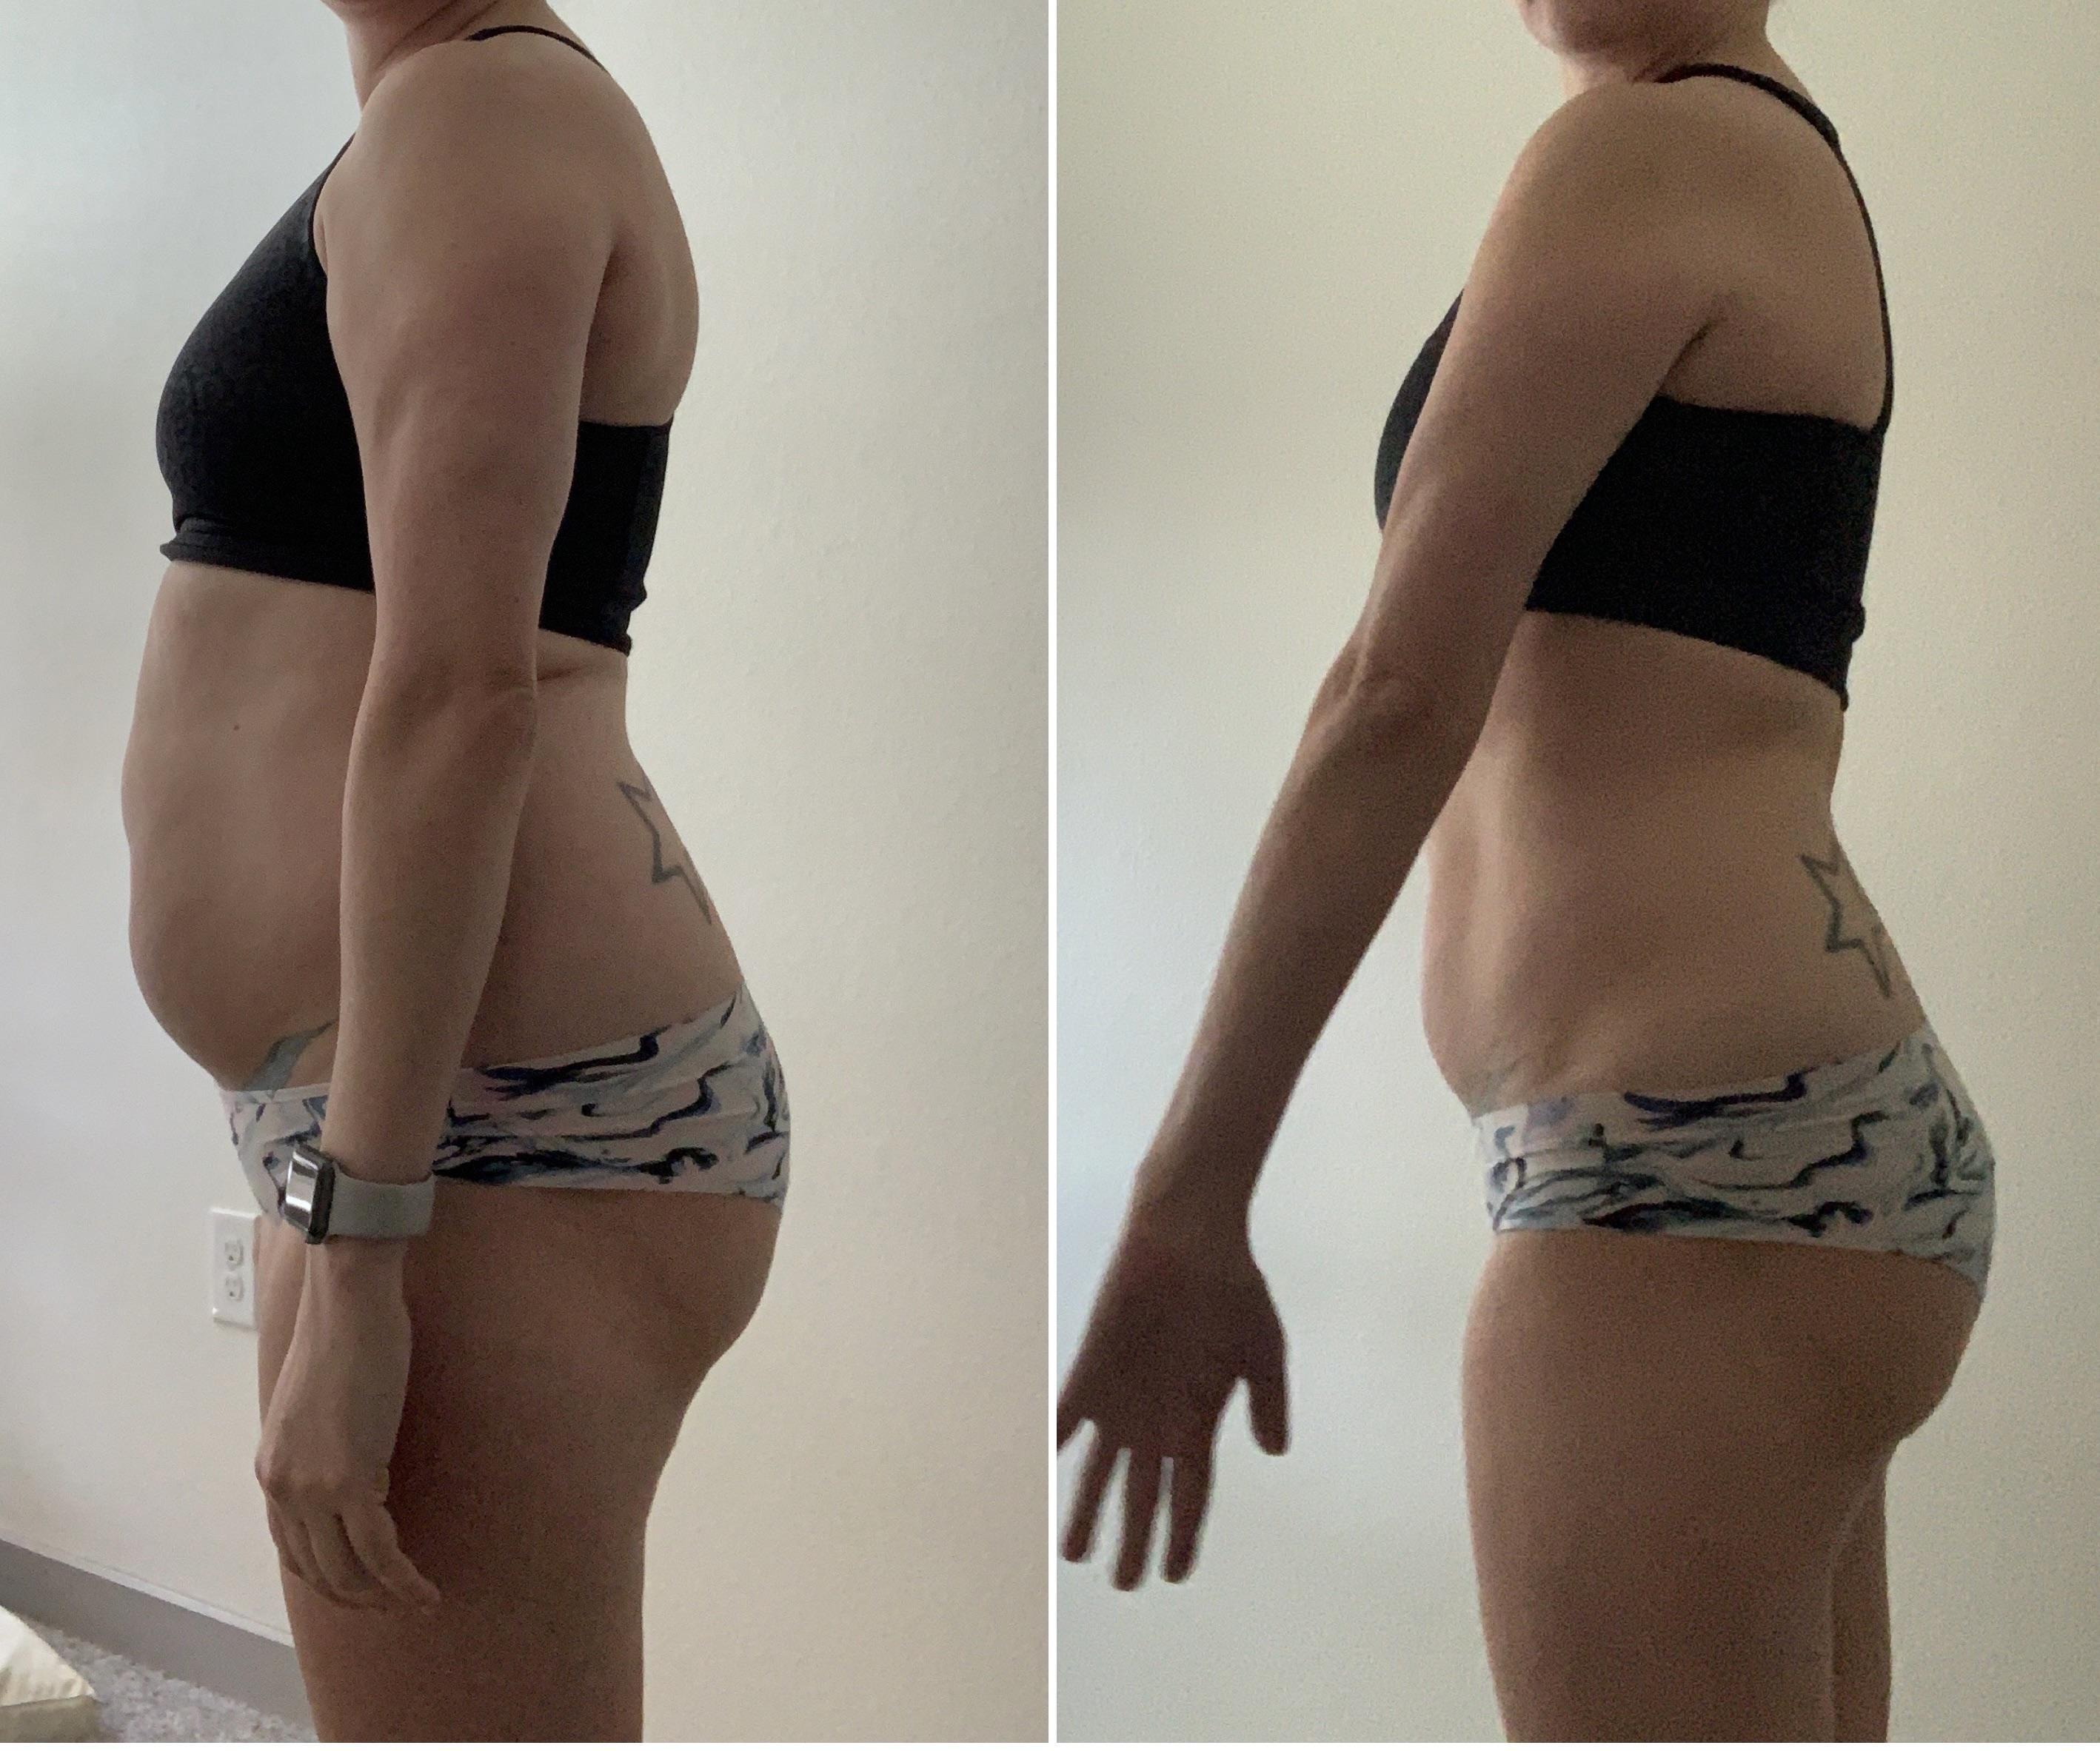 5 feet 5 Female Progress Pics of 15 lbs Weight Loss 151 lbs to 136 lbs